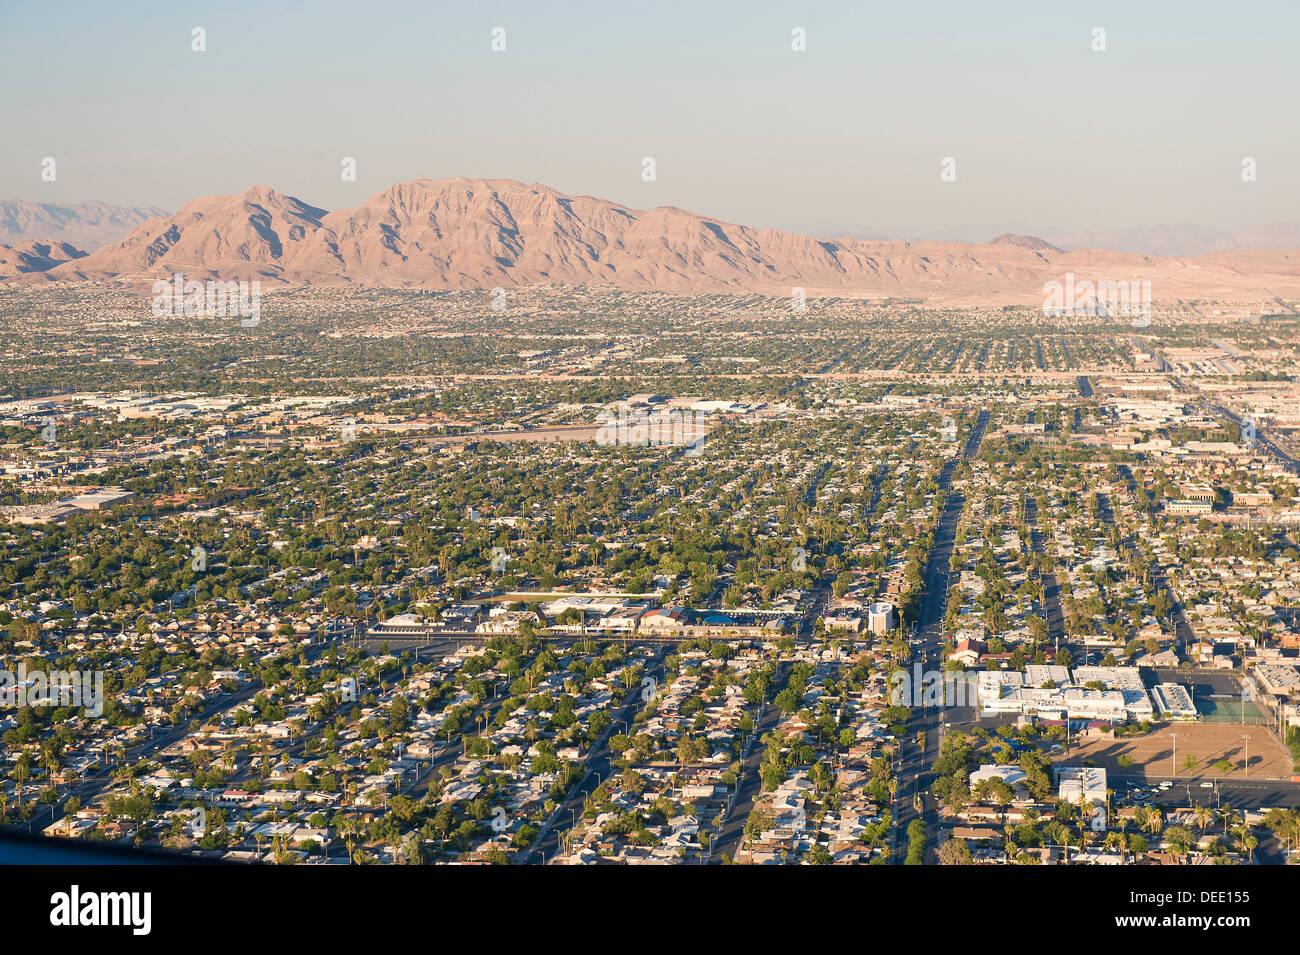 Las Vegas skyline from Stratosphere Tower, Nevada, United States of America, North America - Stock Image